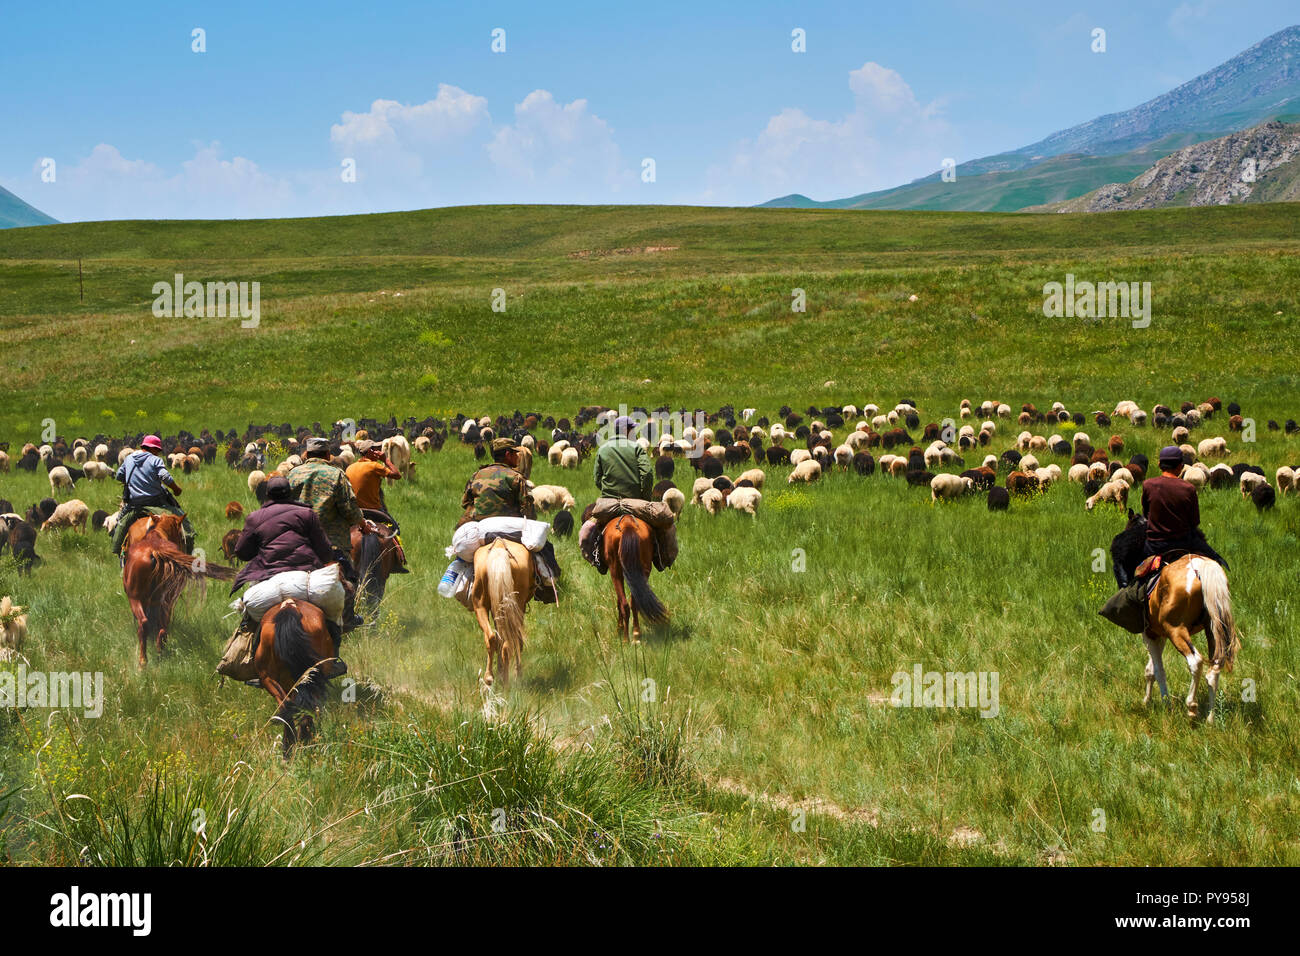 Kyrgyzstan, Naryn province, transhumance of Kirghiz nomadic people - Stock Image